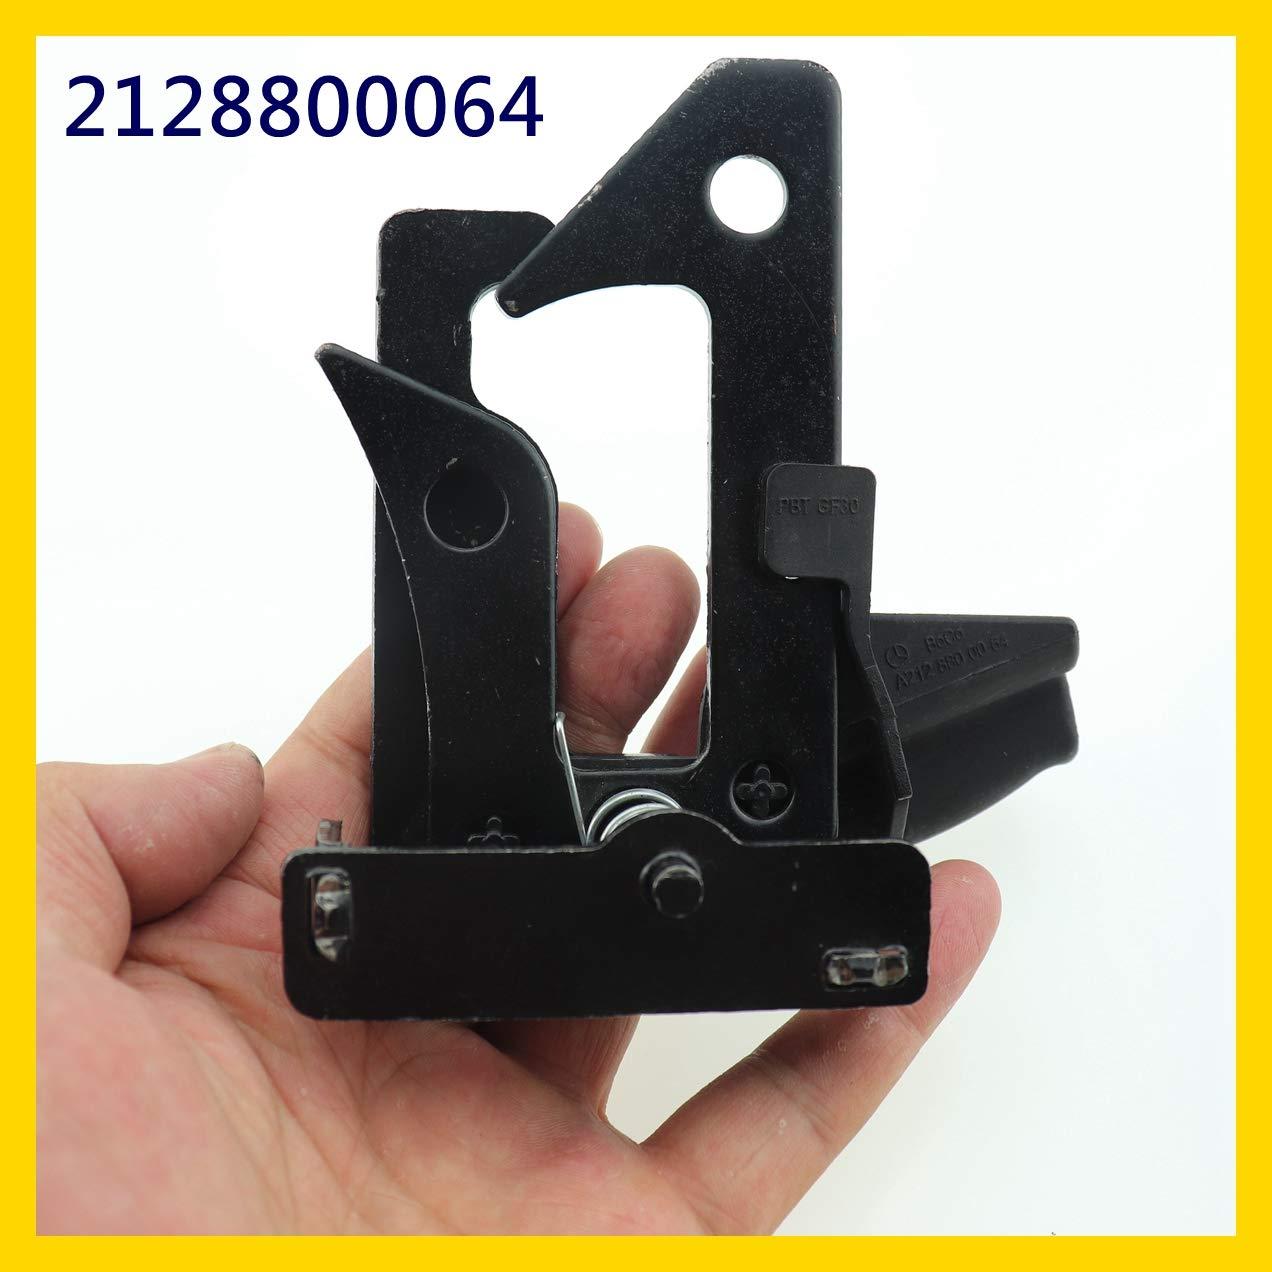 DZNTMY New for Mercedes-Benz E350 2010-2014 Hood Safety Hook Latch Lock 2128800064